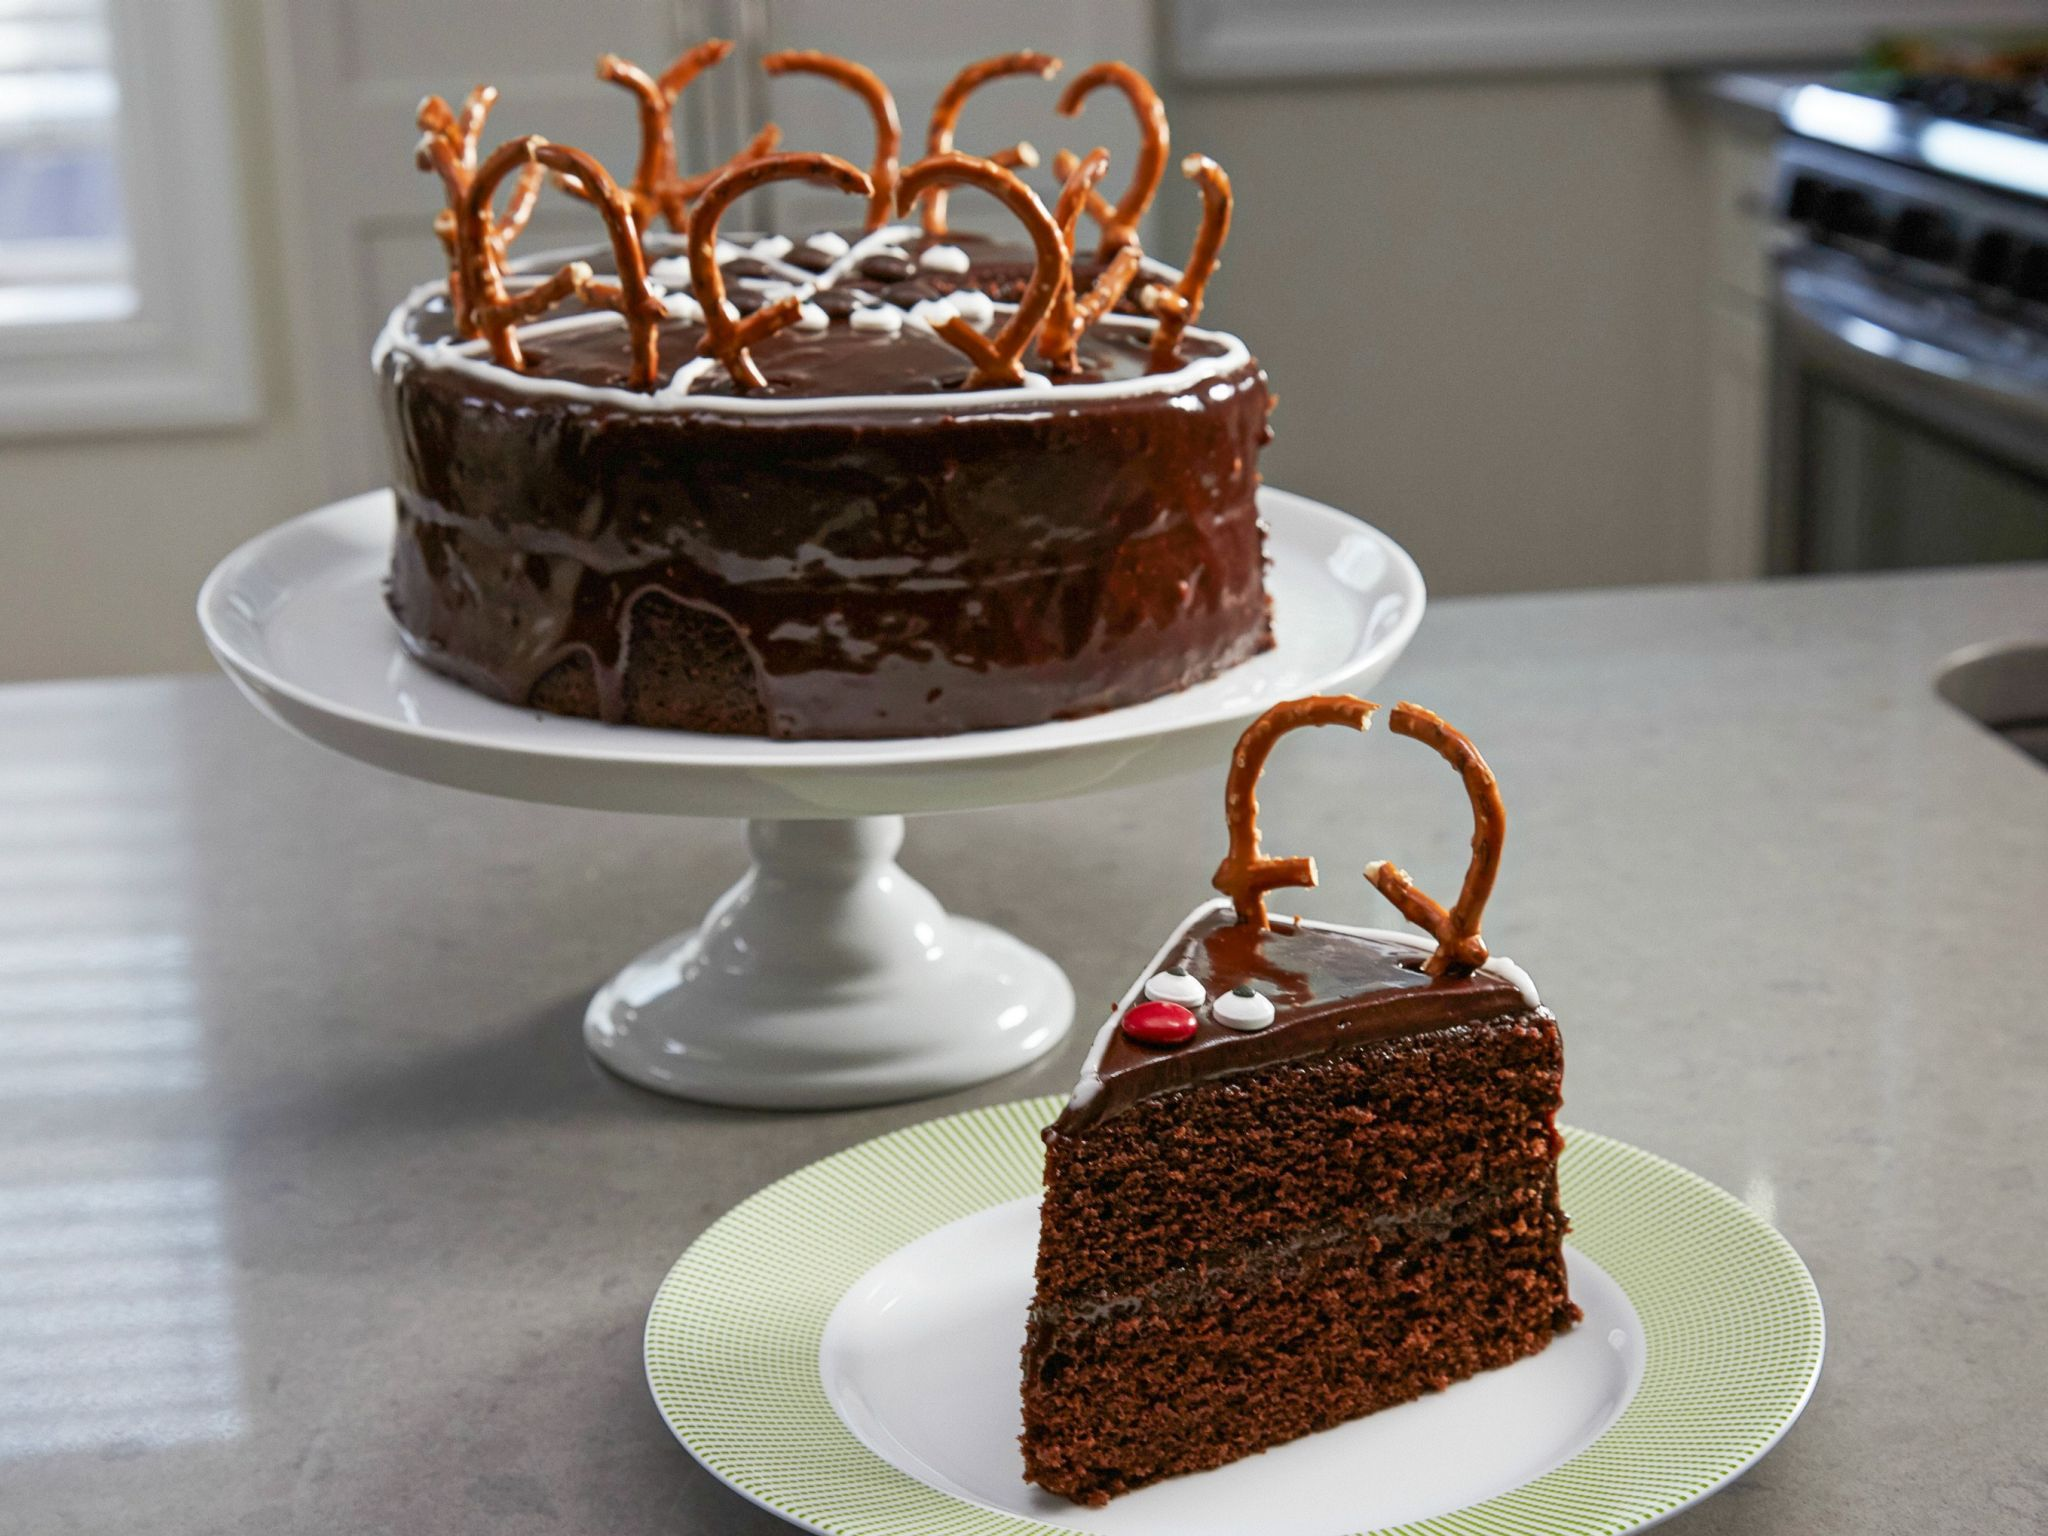 Chocolate reindeer cake recipe chocolate cake and kitchens chocolate reindeer cake christmas dessertsholiday treatsholiday foodschristmas recipesholiday forumfinder Gallery